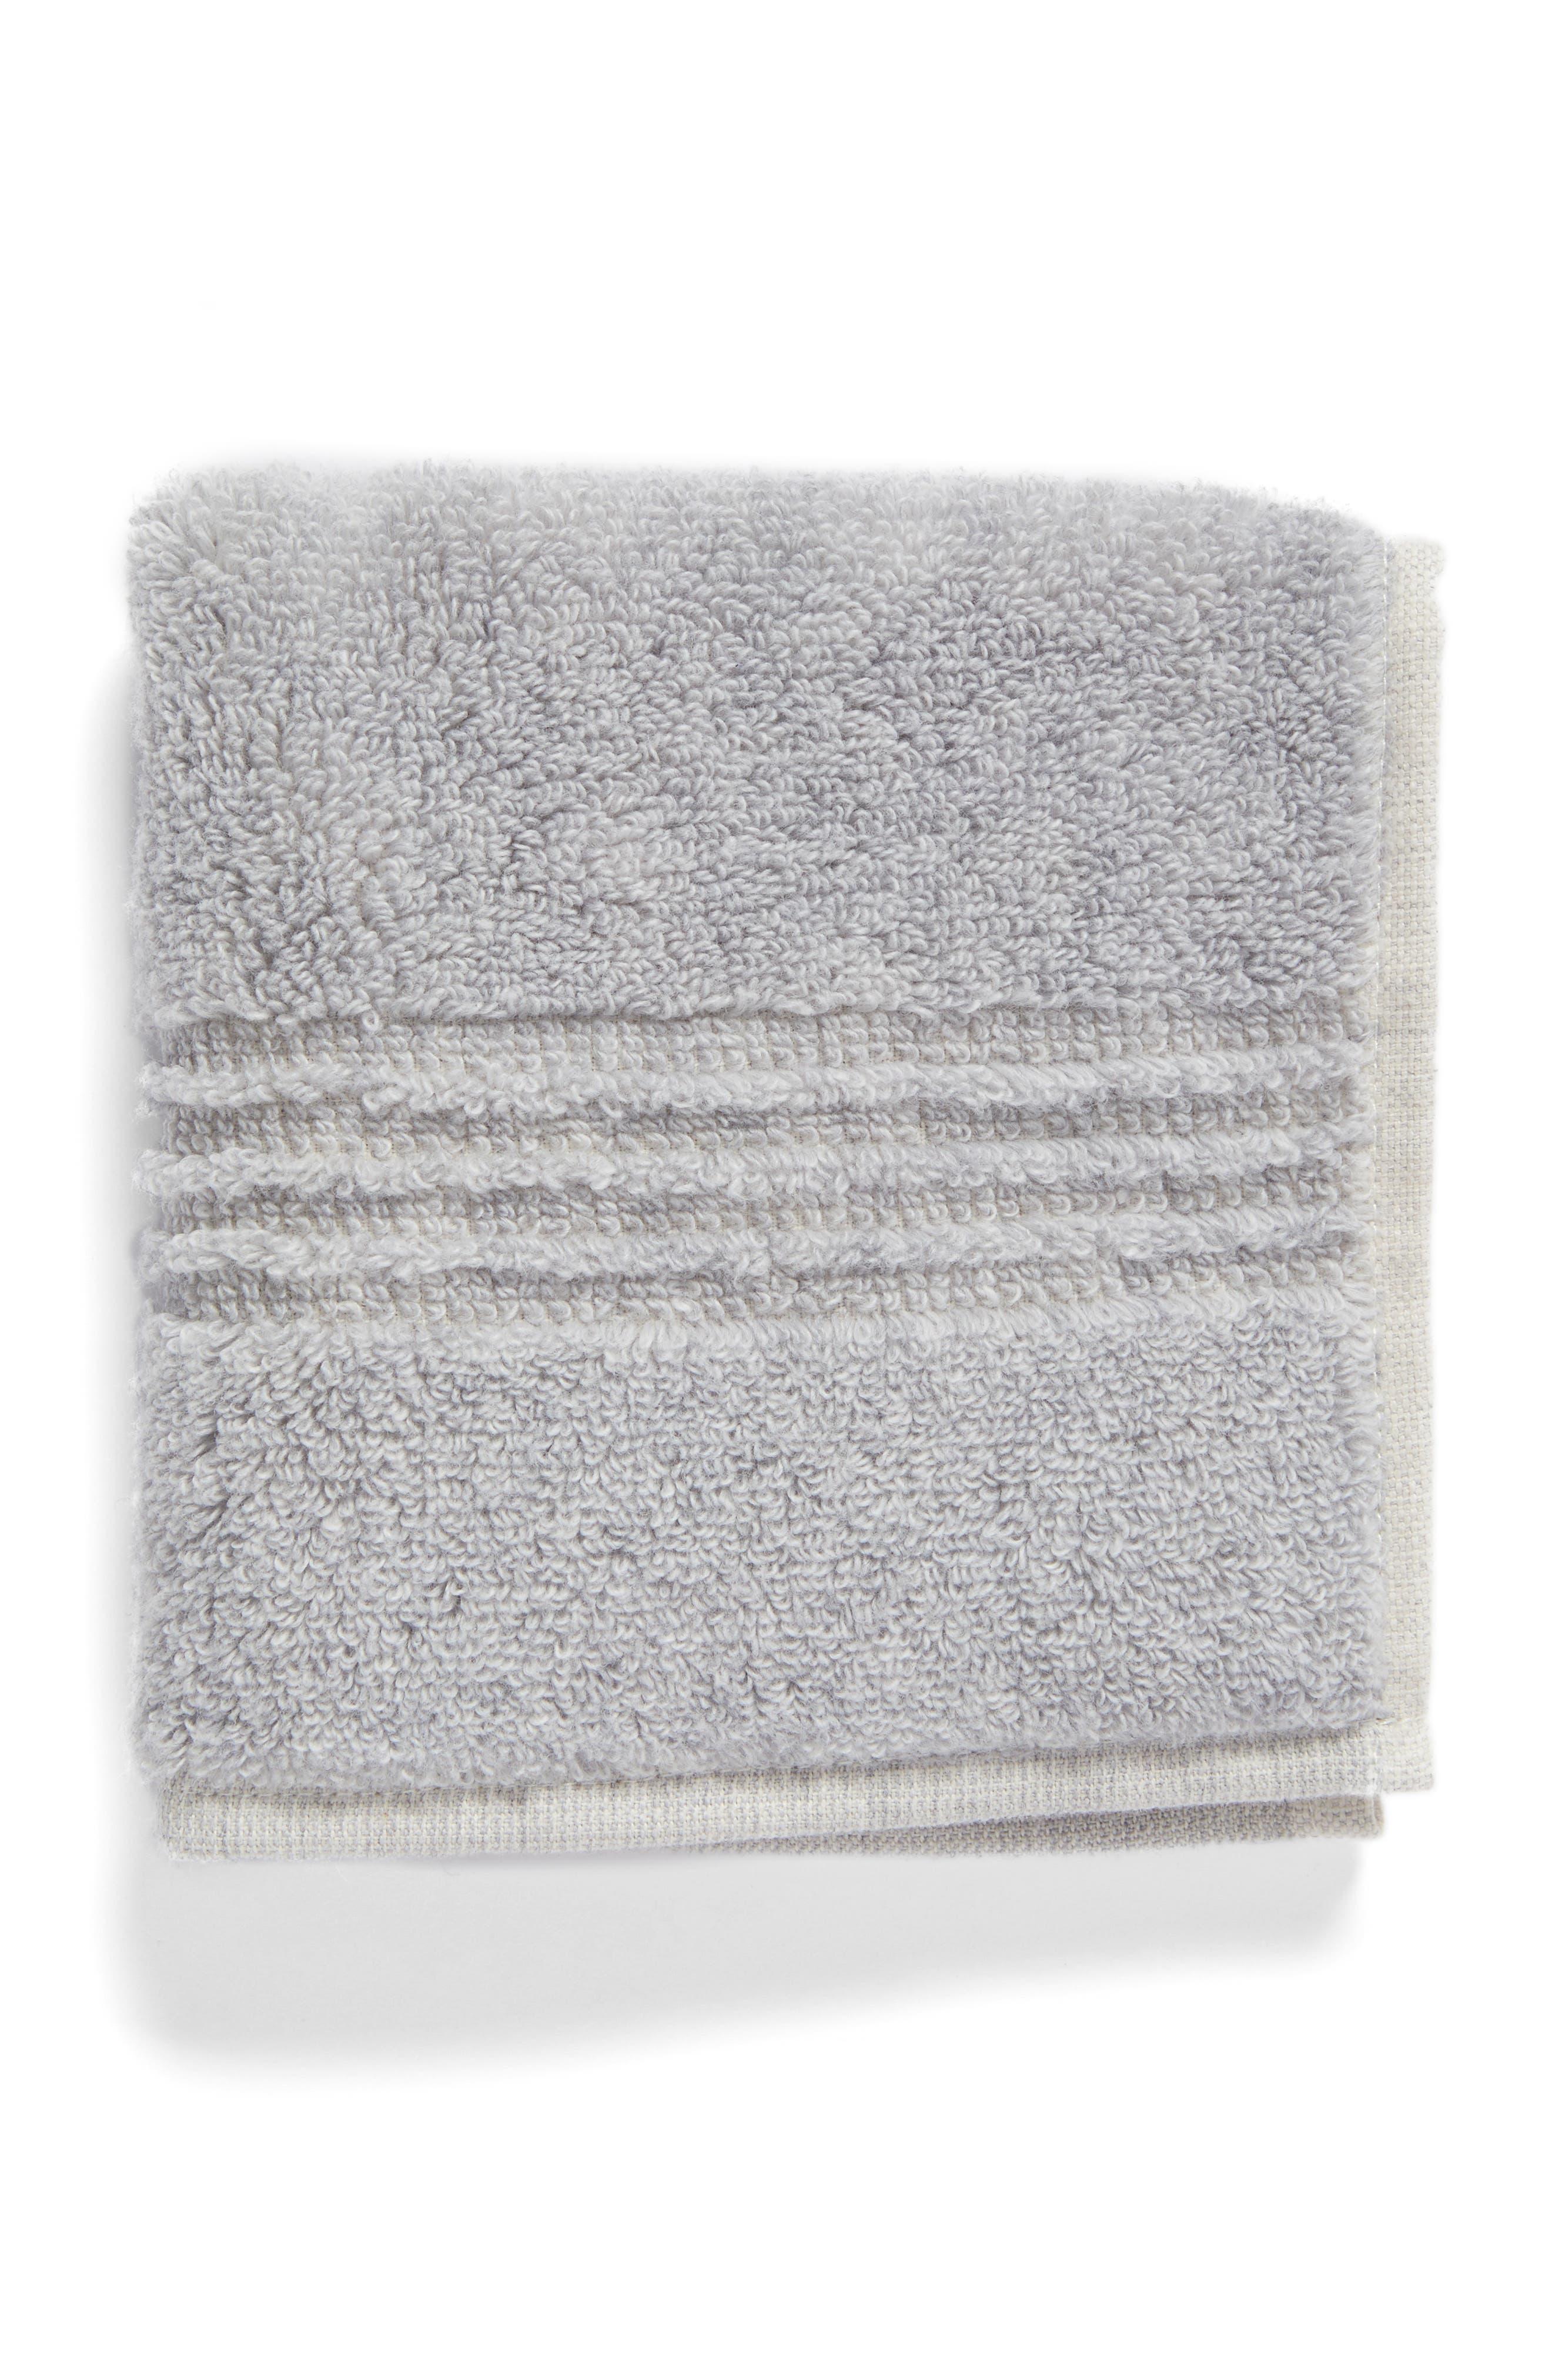 Organic Hydrocotton Washcloth,                             Main thumbnail 1, color,                             Grey Soft